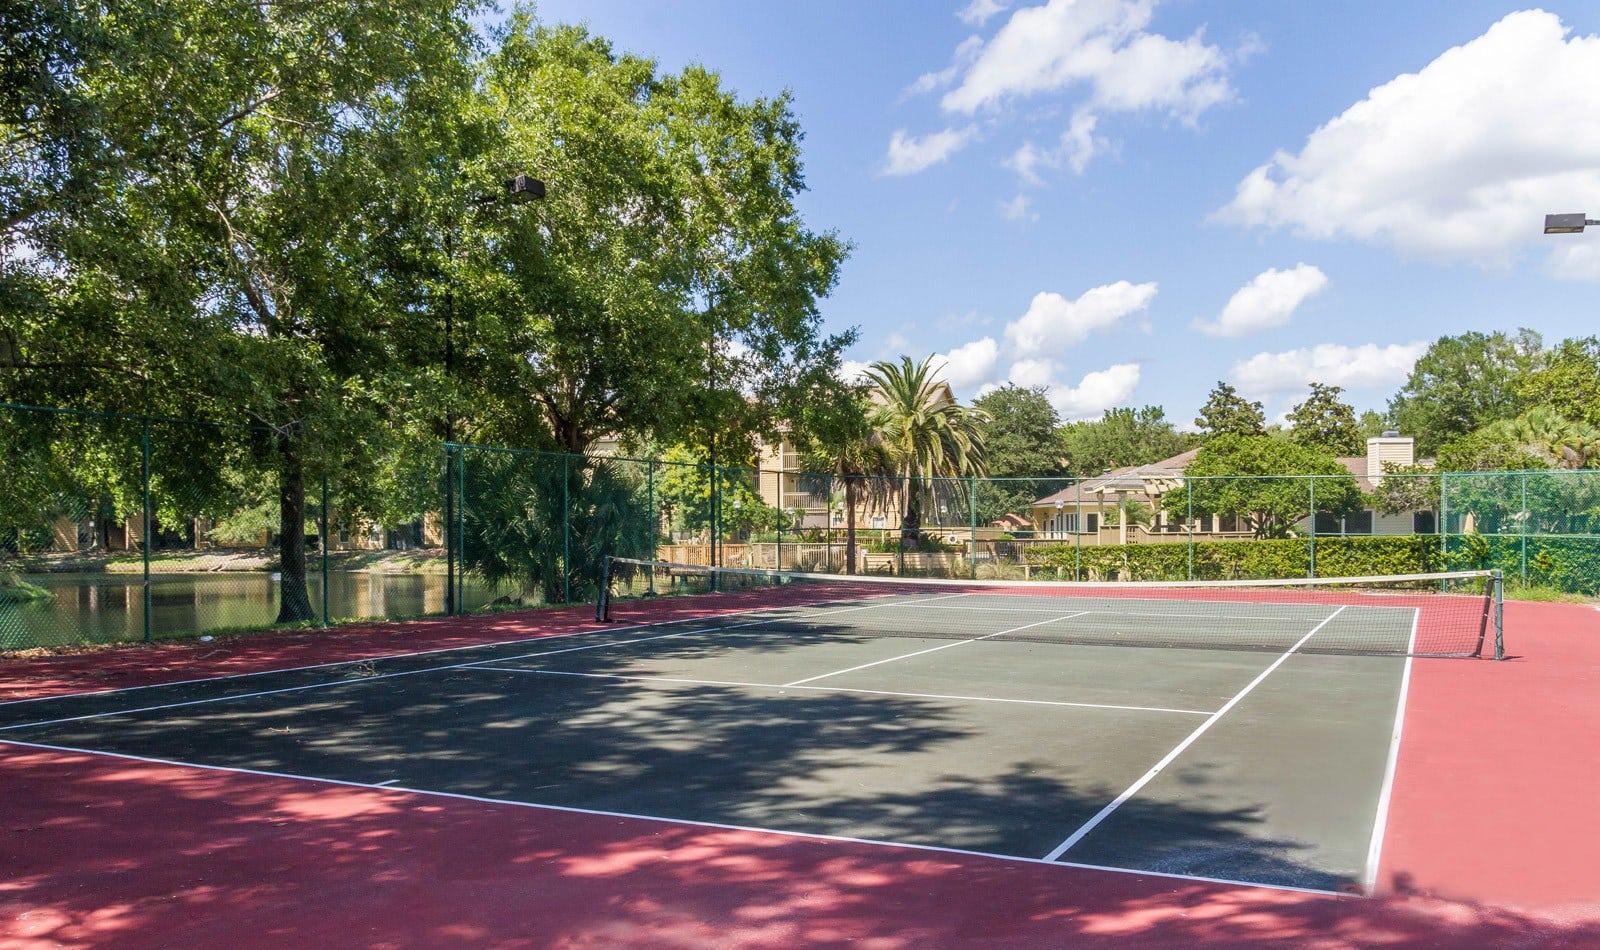 Outdoor Tennis Court in Orange Park Apartments